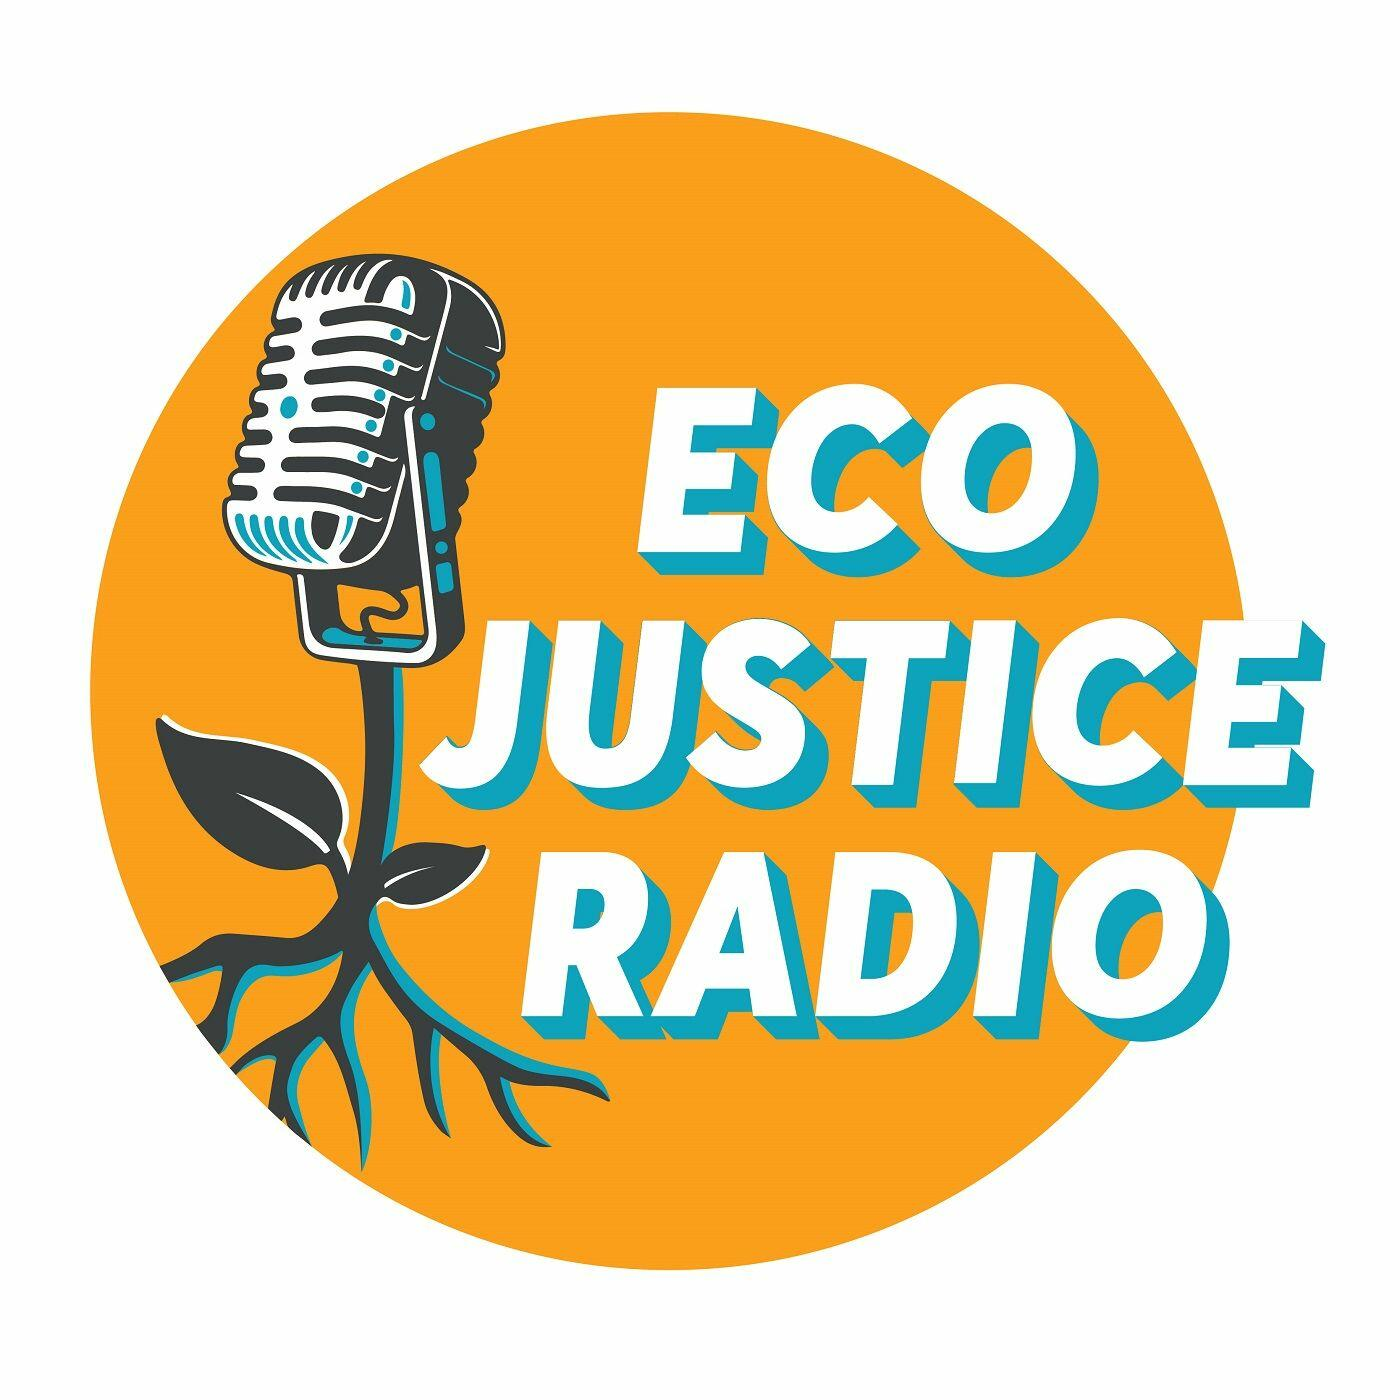 EcoJustice Radio